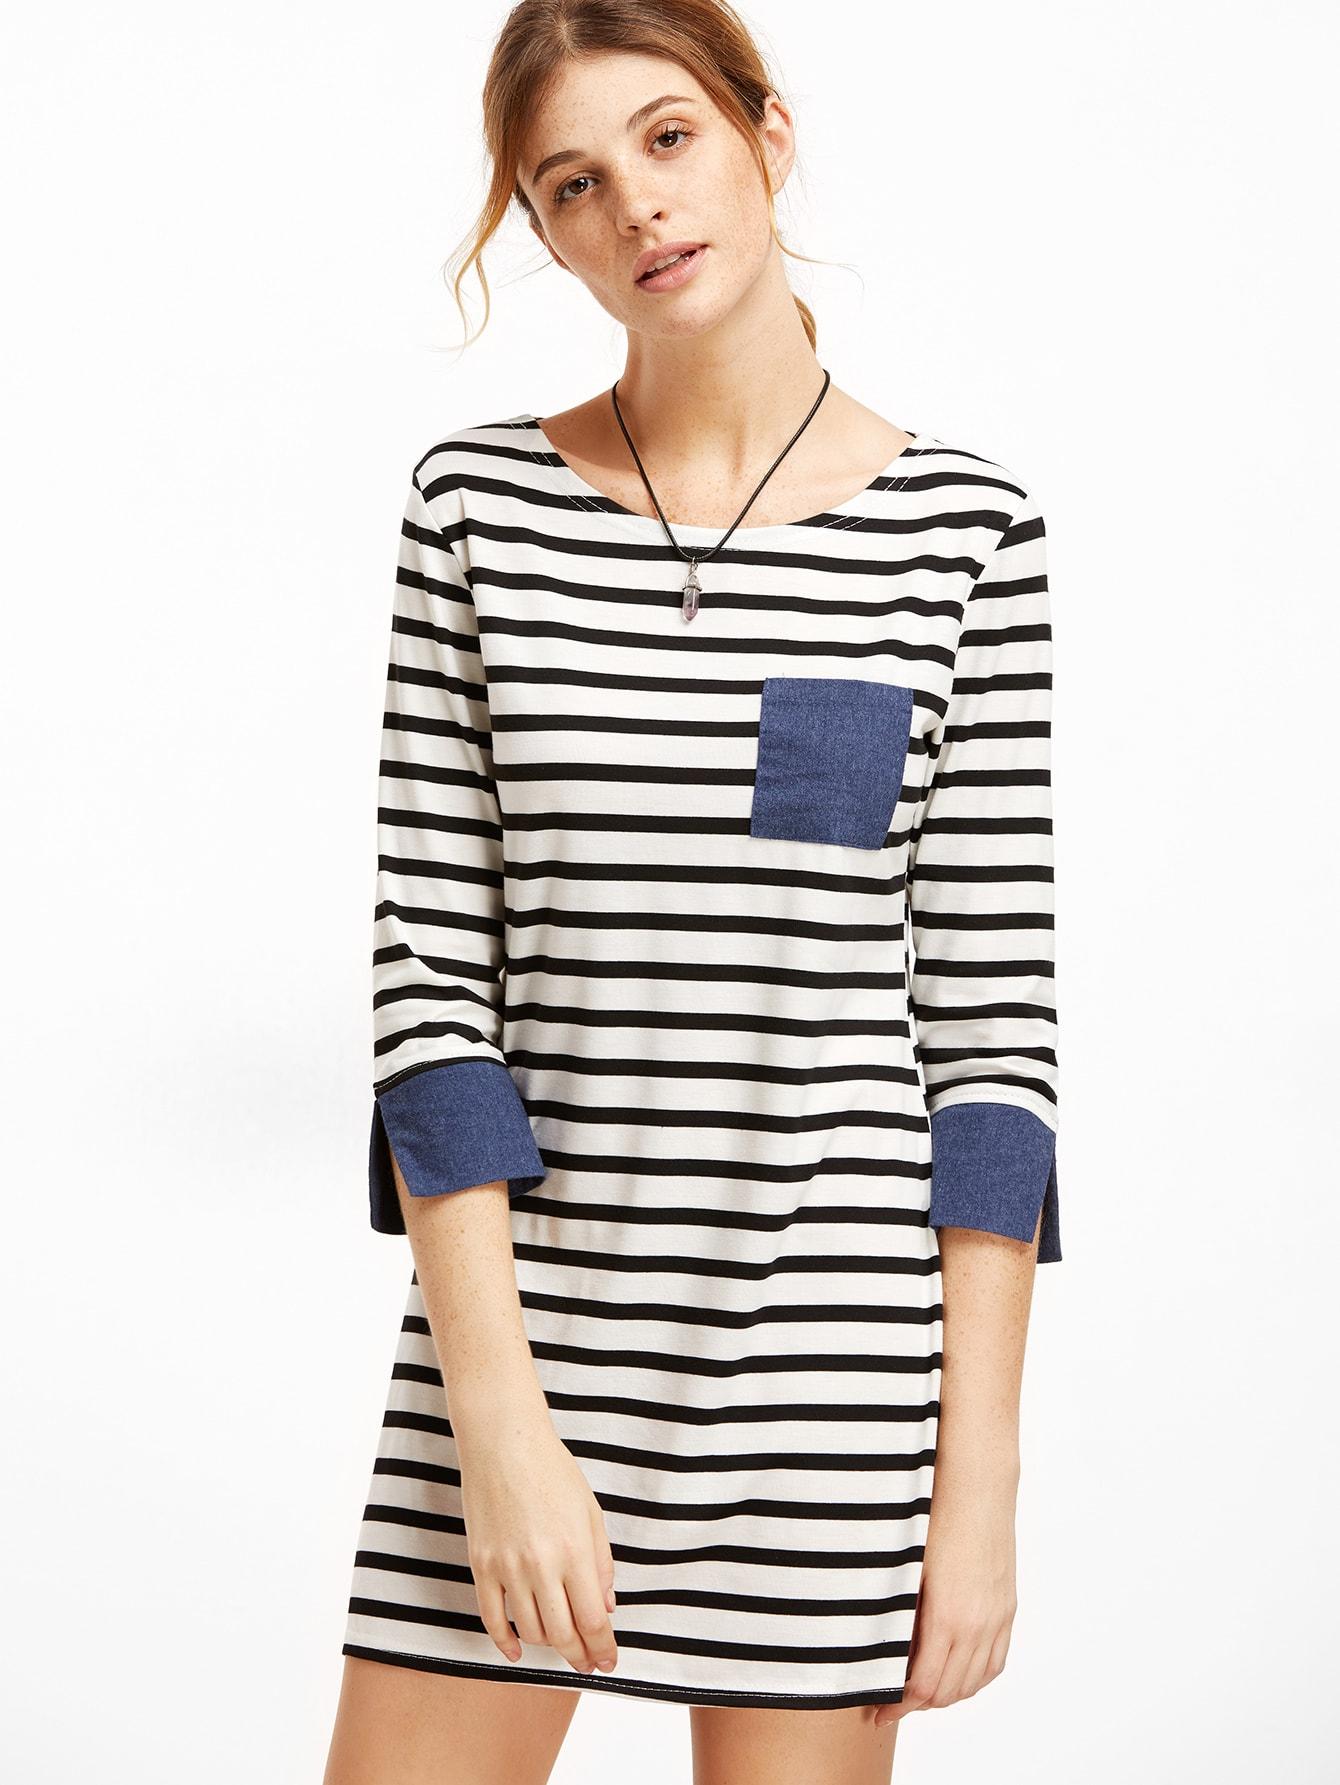 Contrast Trim Striped Tee Dress dress161006301